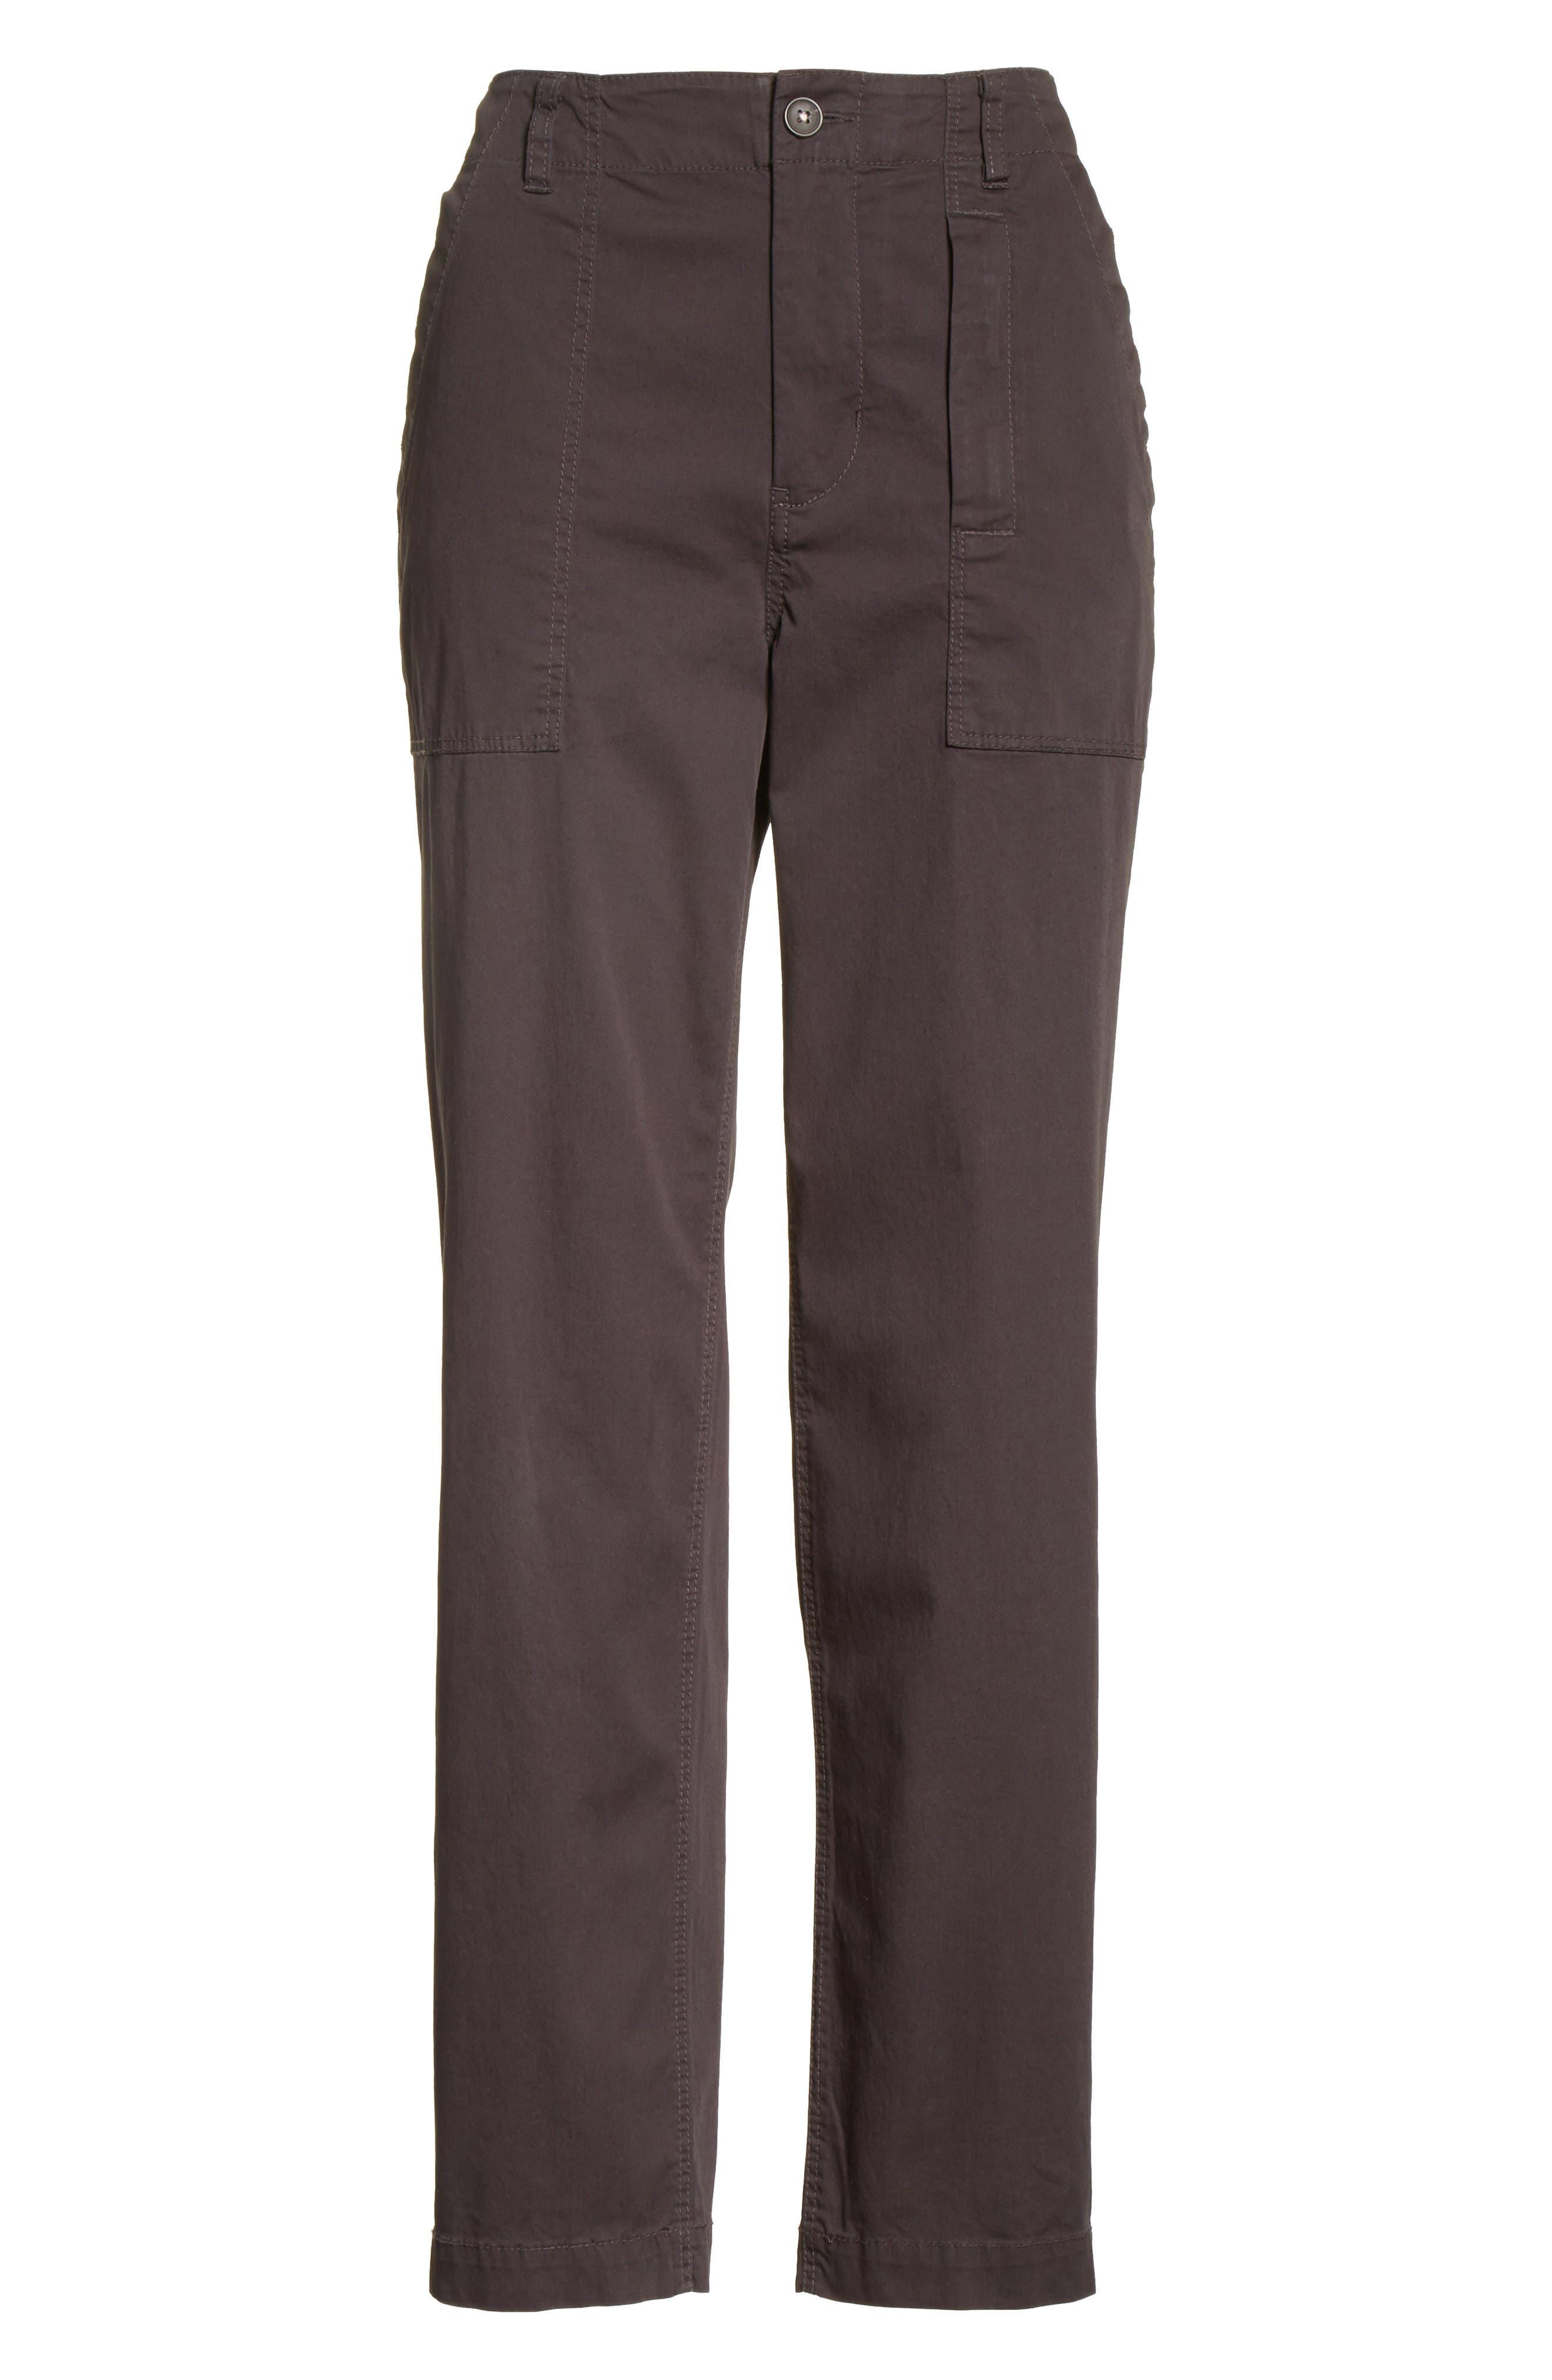 Florian High Waist Pants,                             Alternate thumbnail 6, color,                             065